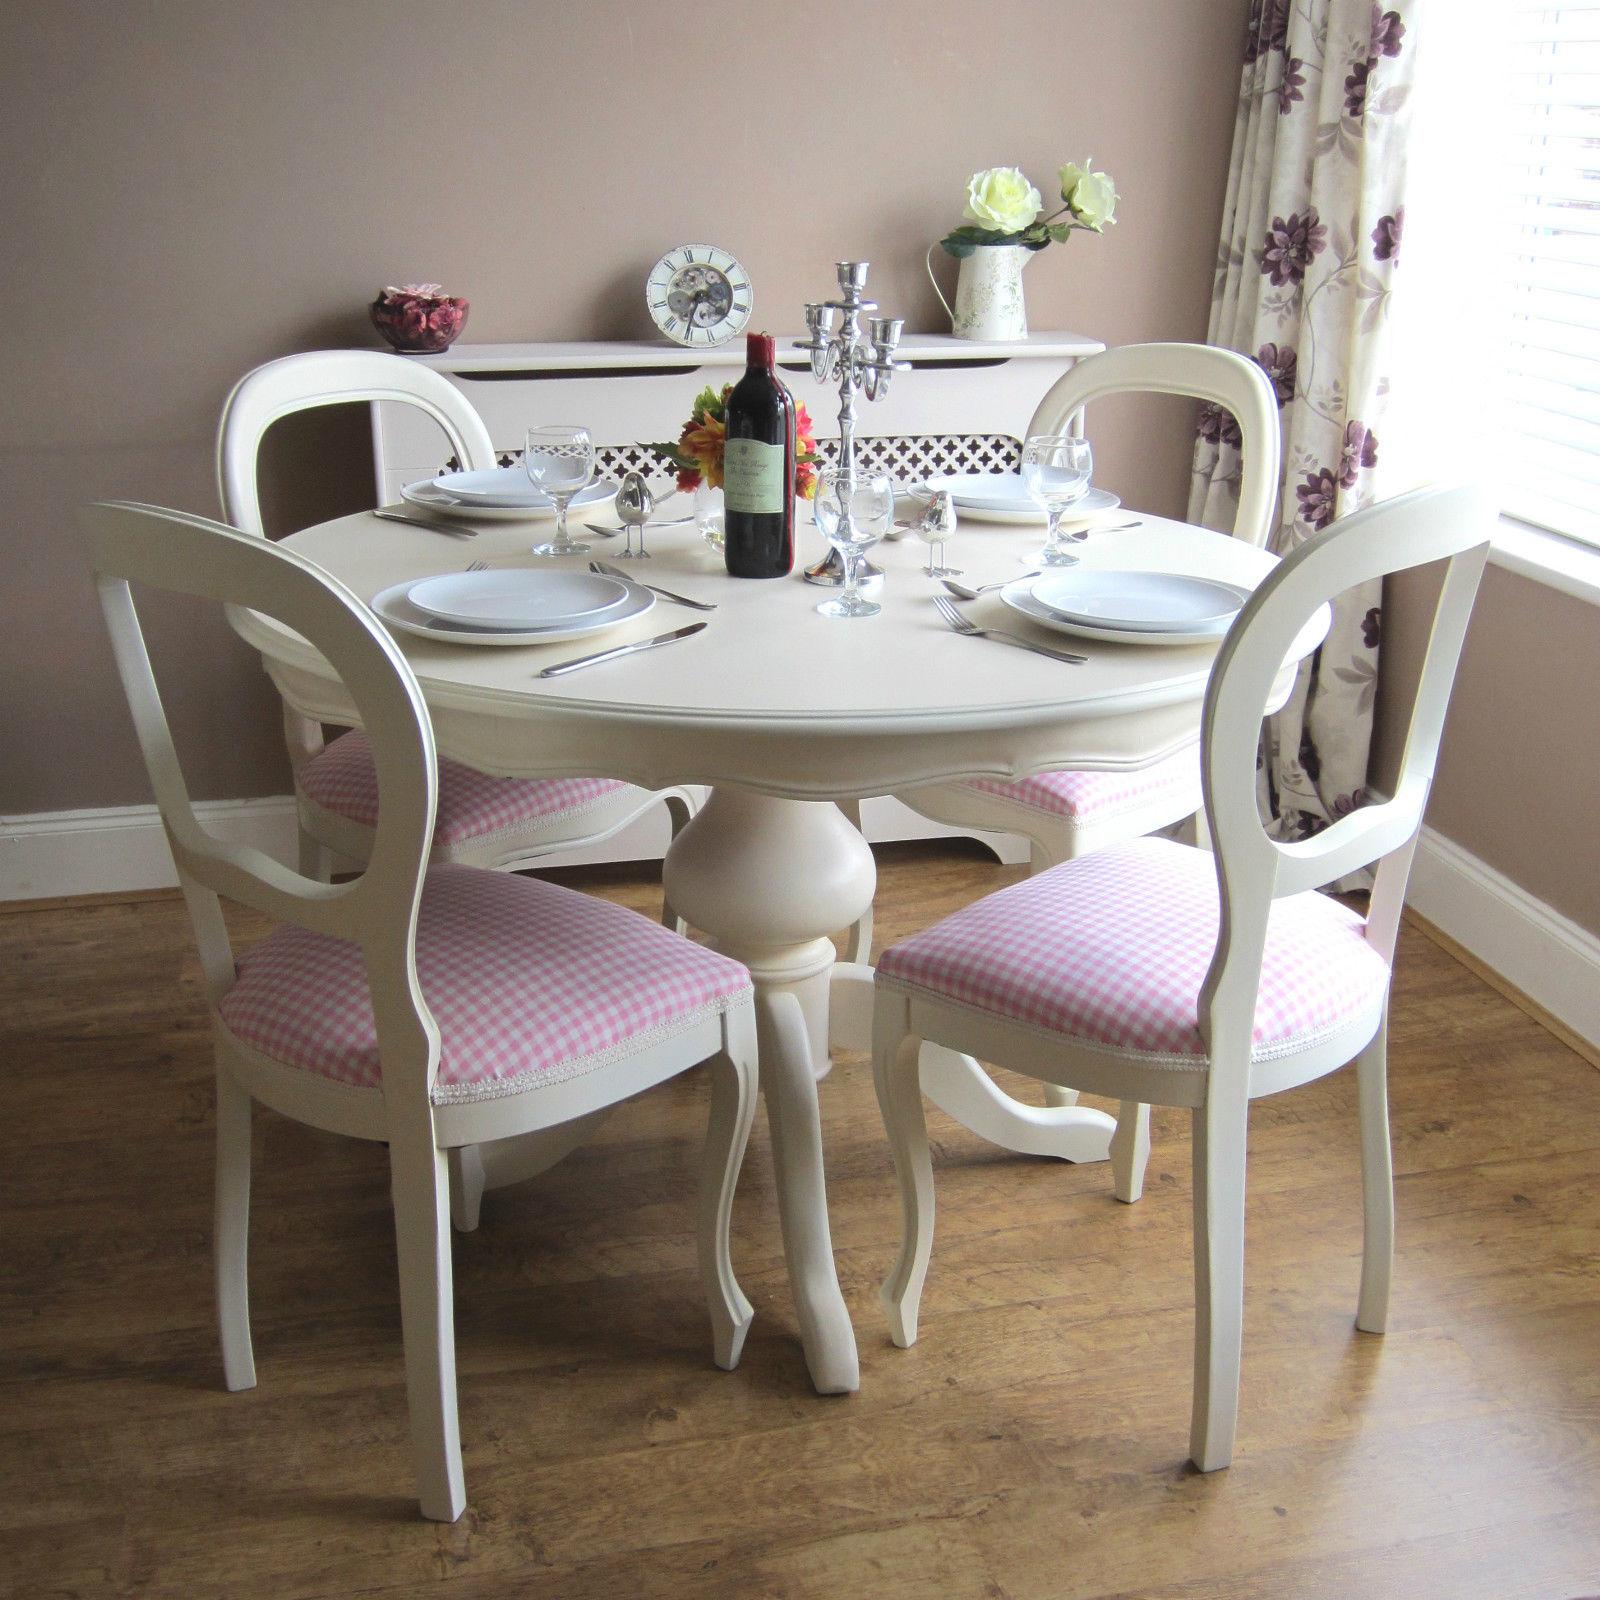 White Round Kitchen Table round kitchen table sets for 4 round kitchen table sets for 4